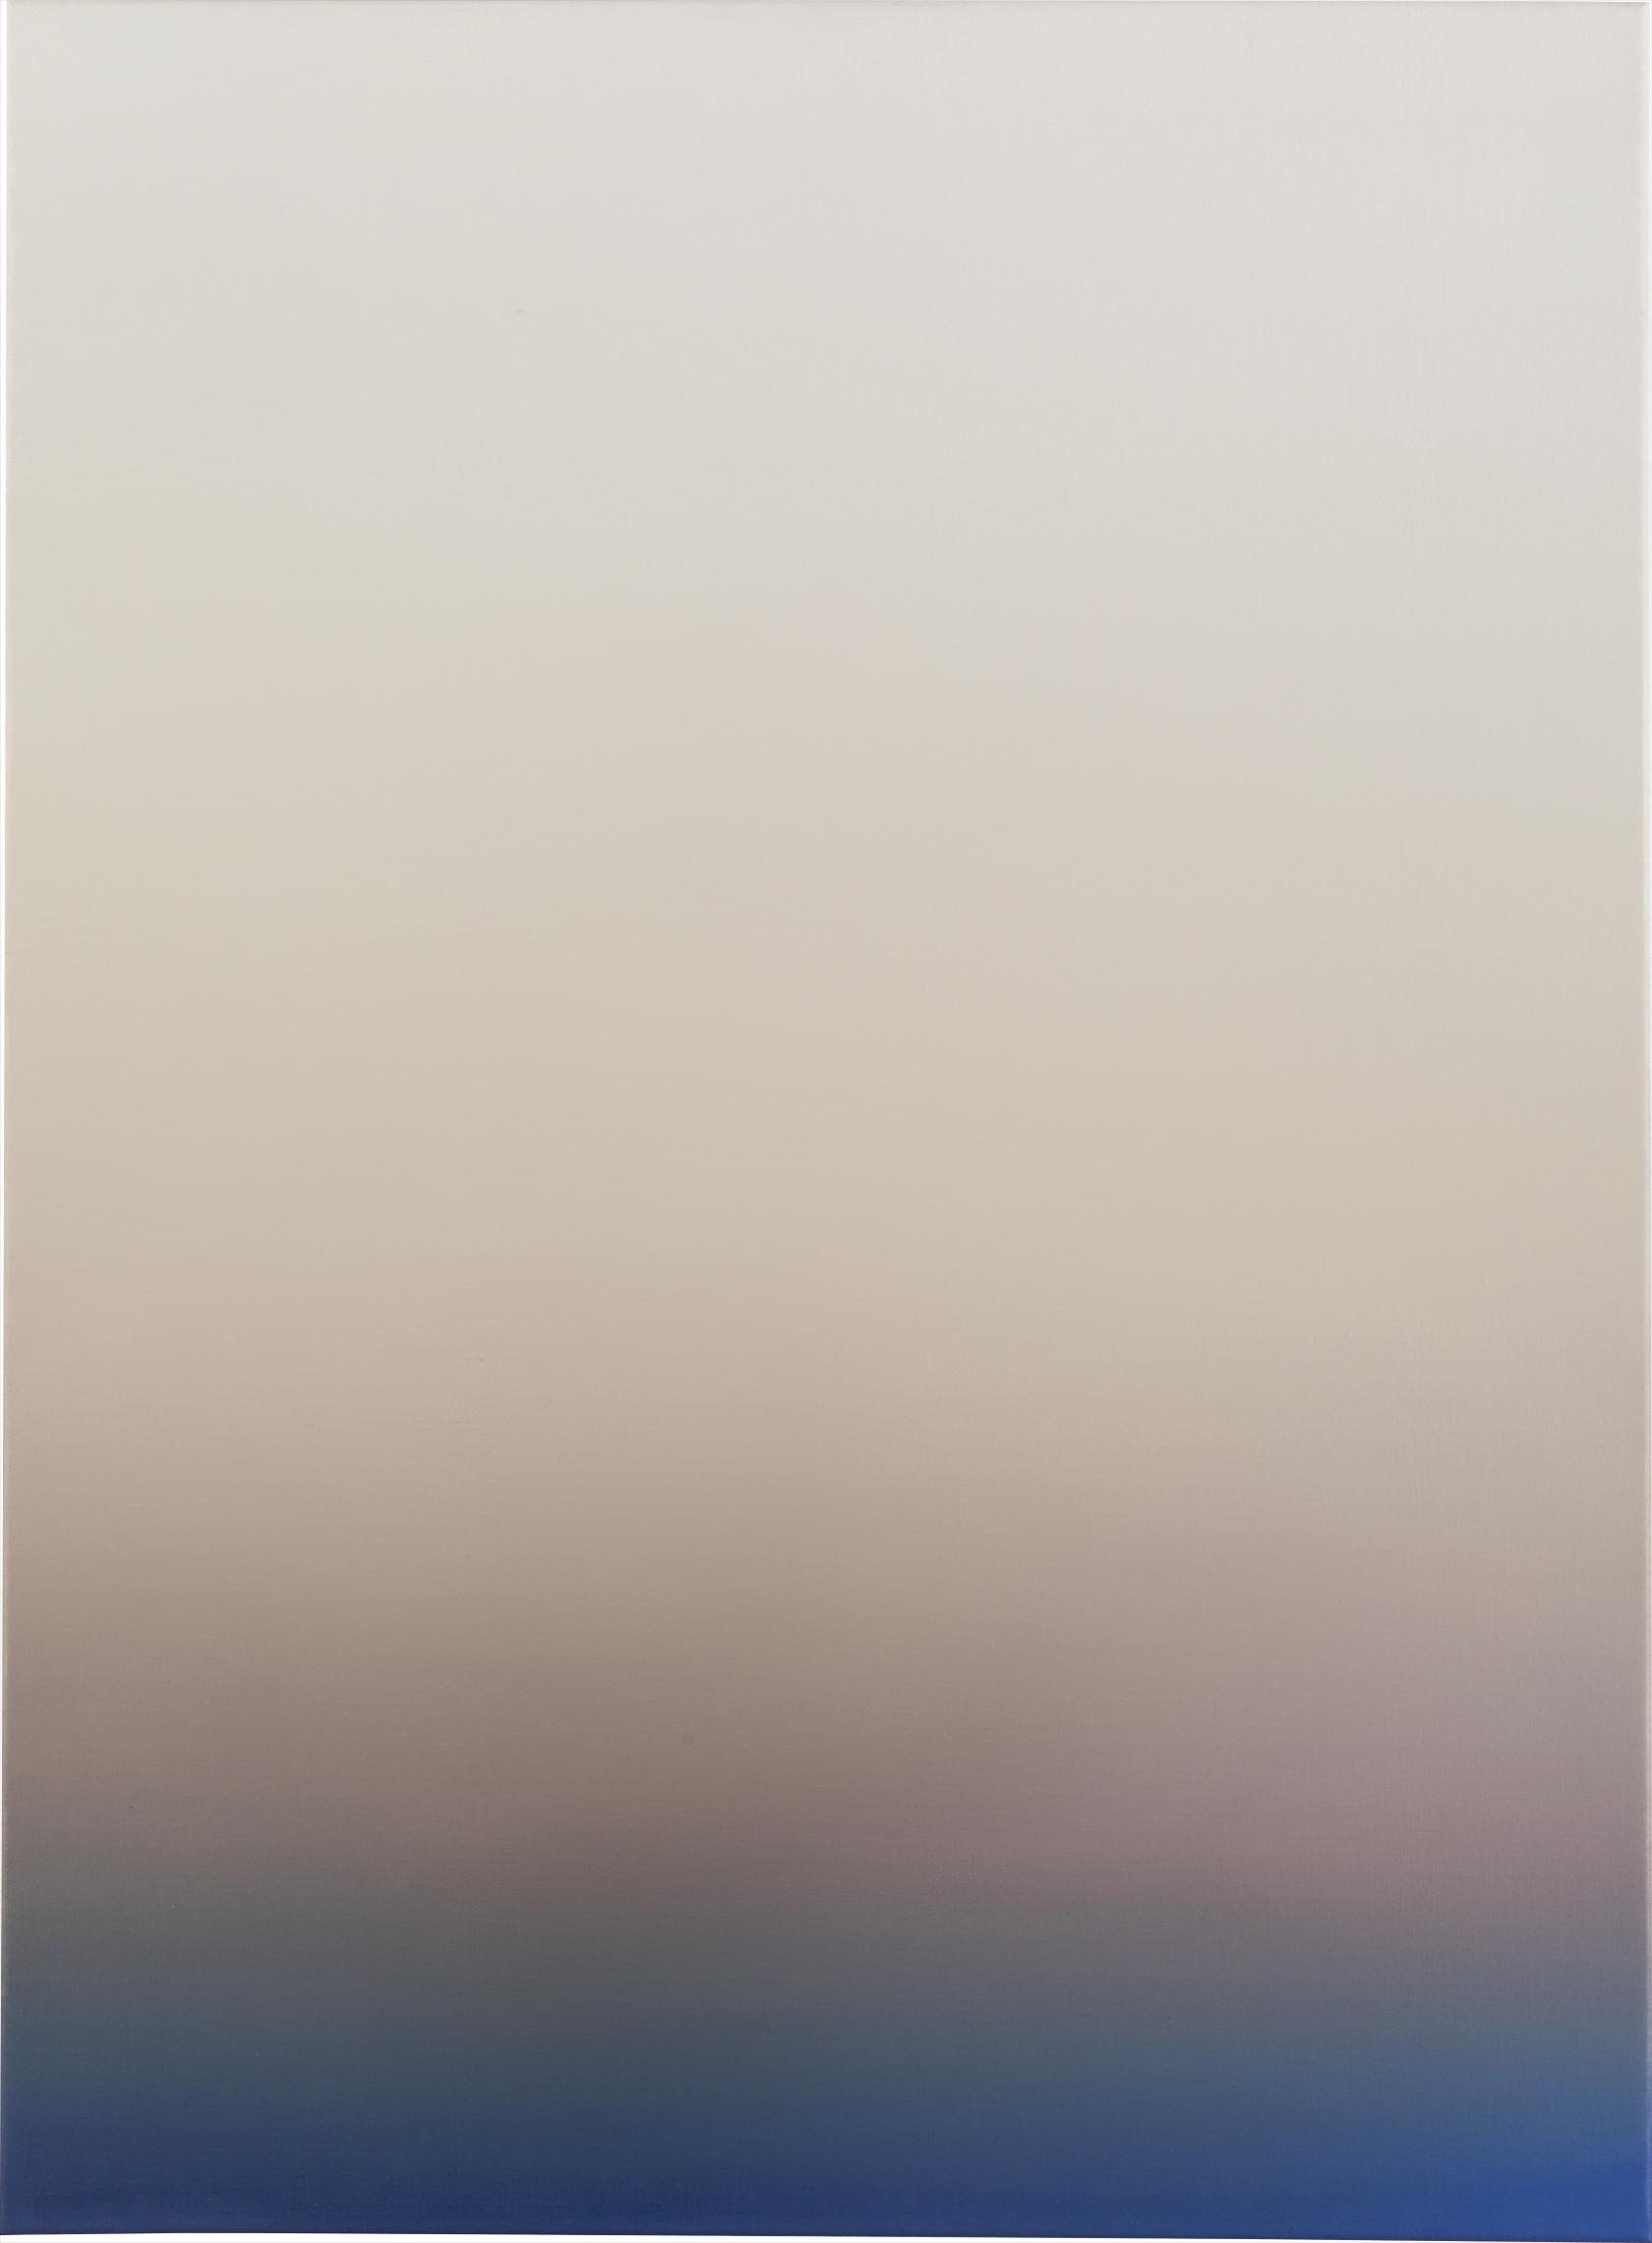 Pieter Vermeersch - Untitled-2018